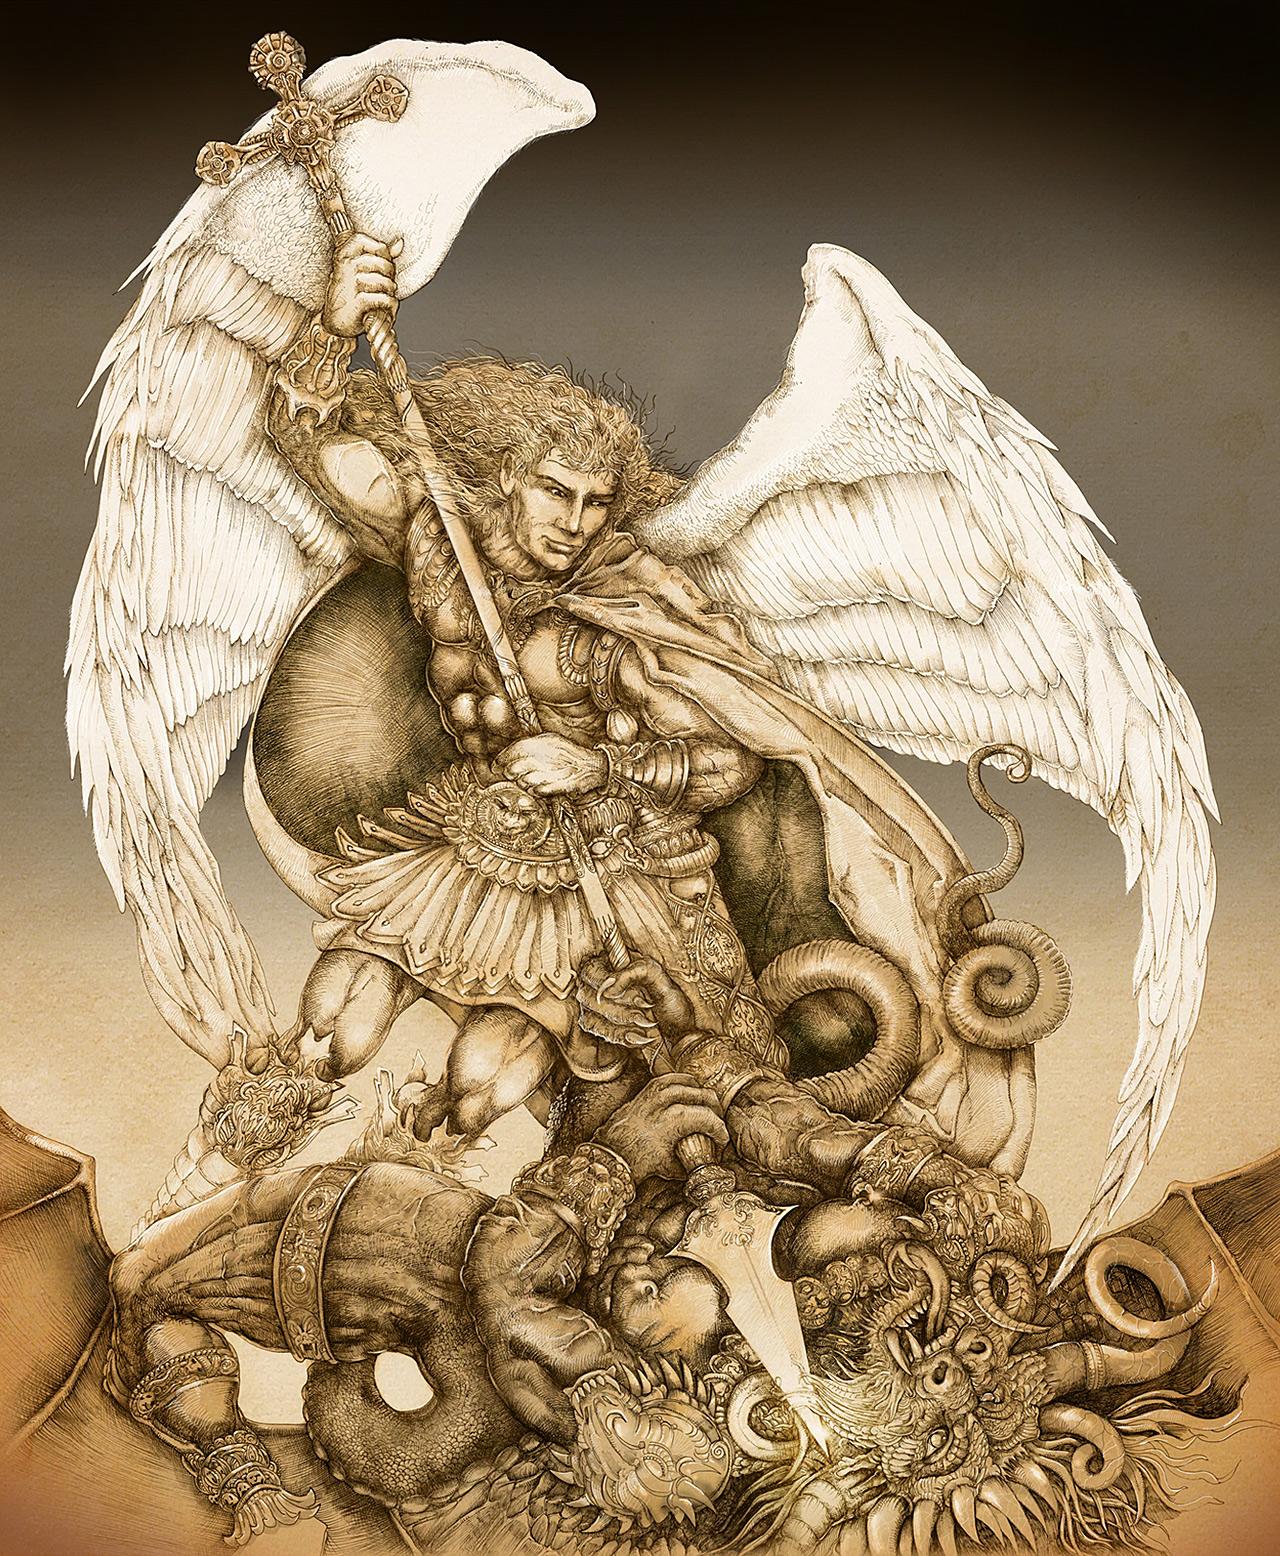 Archangel Michael By PaperCutIllustration On DeviantArt